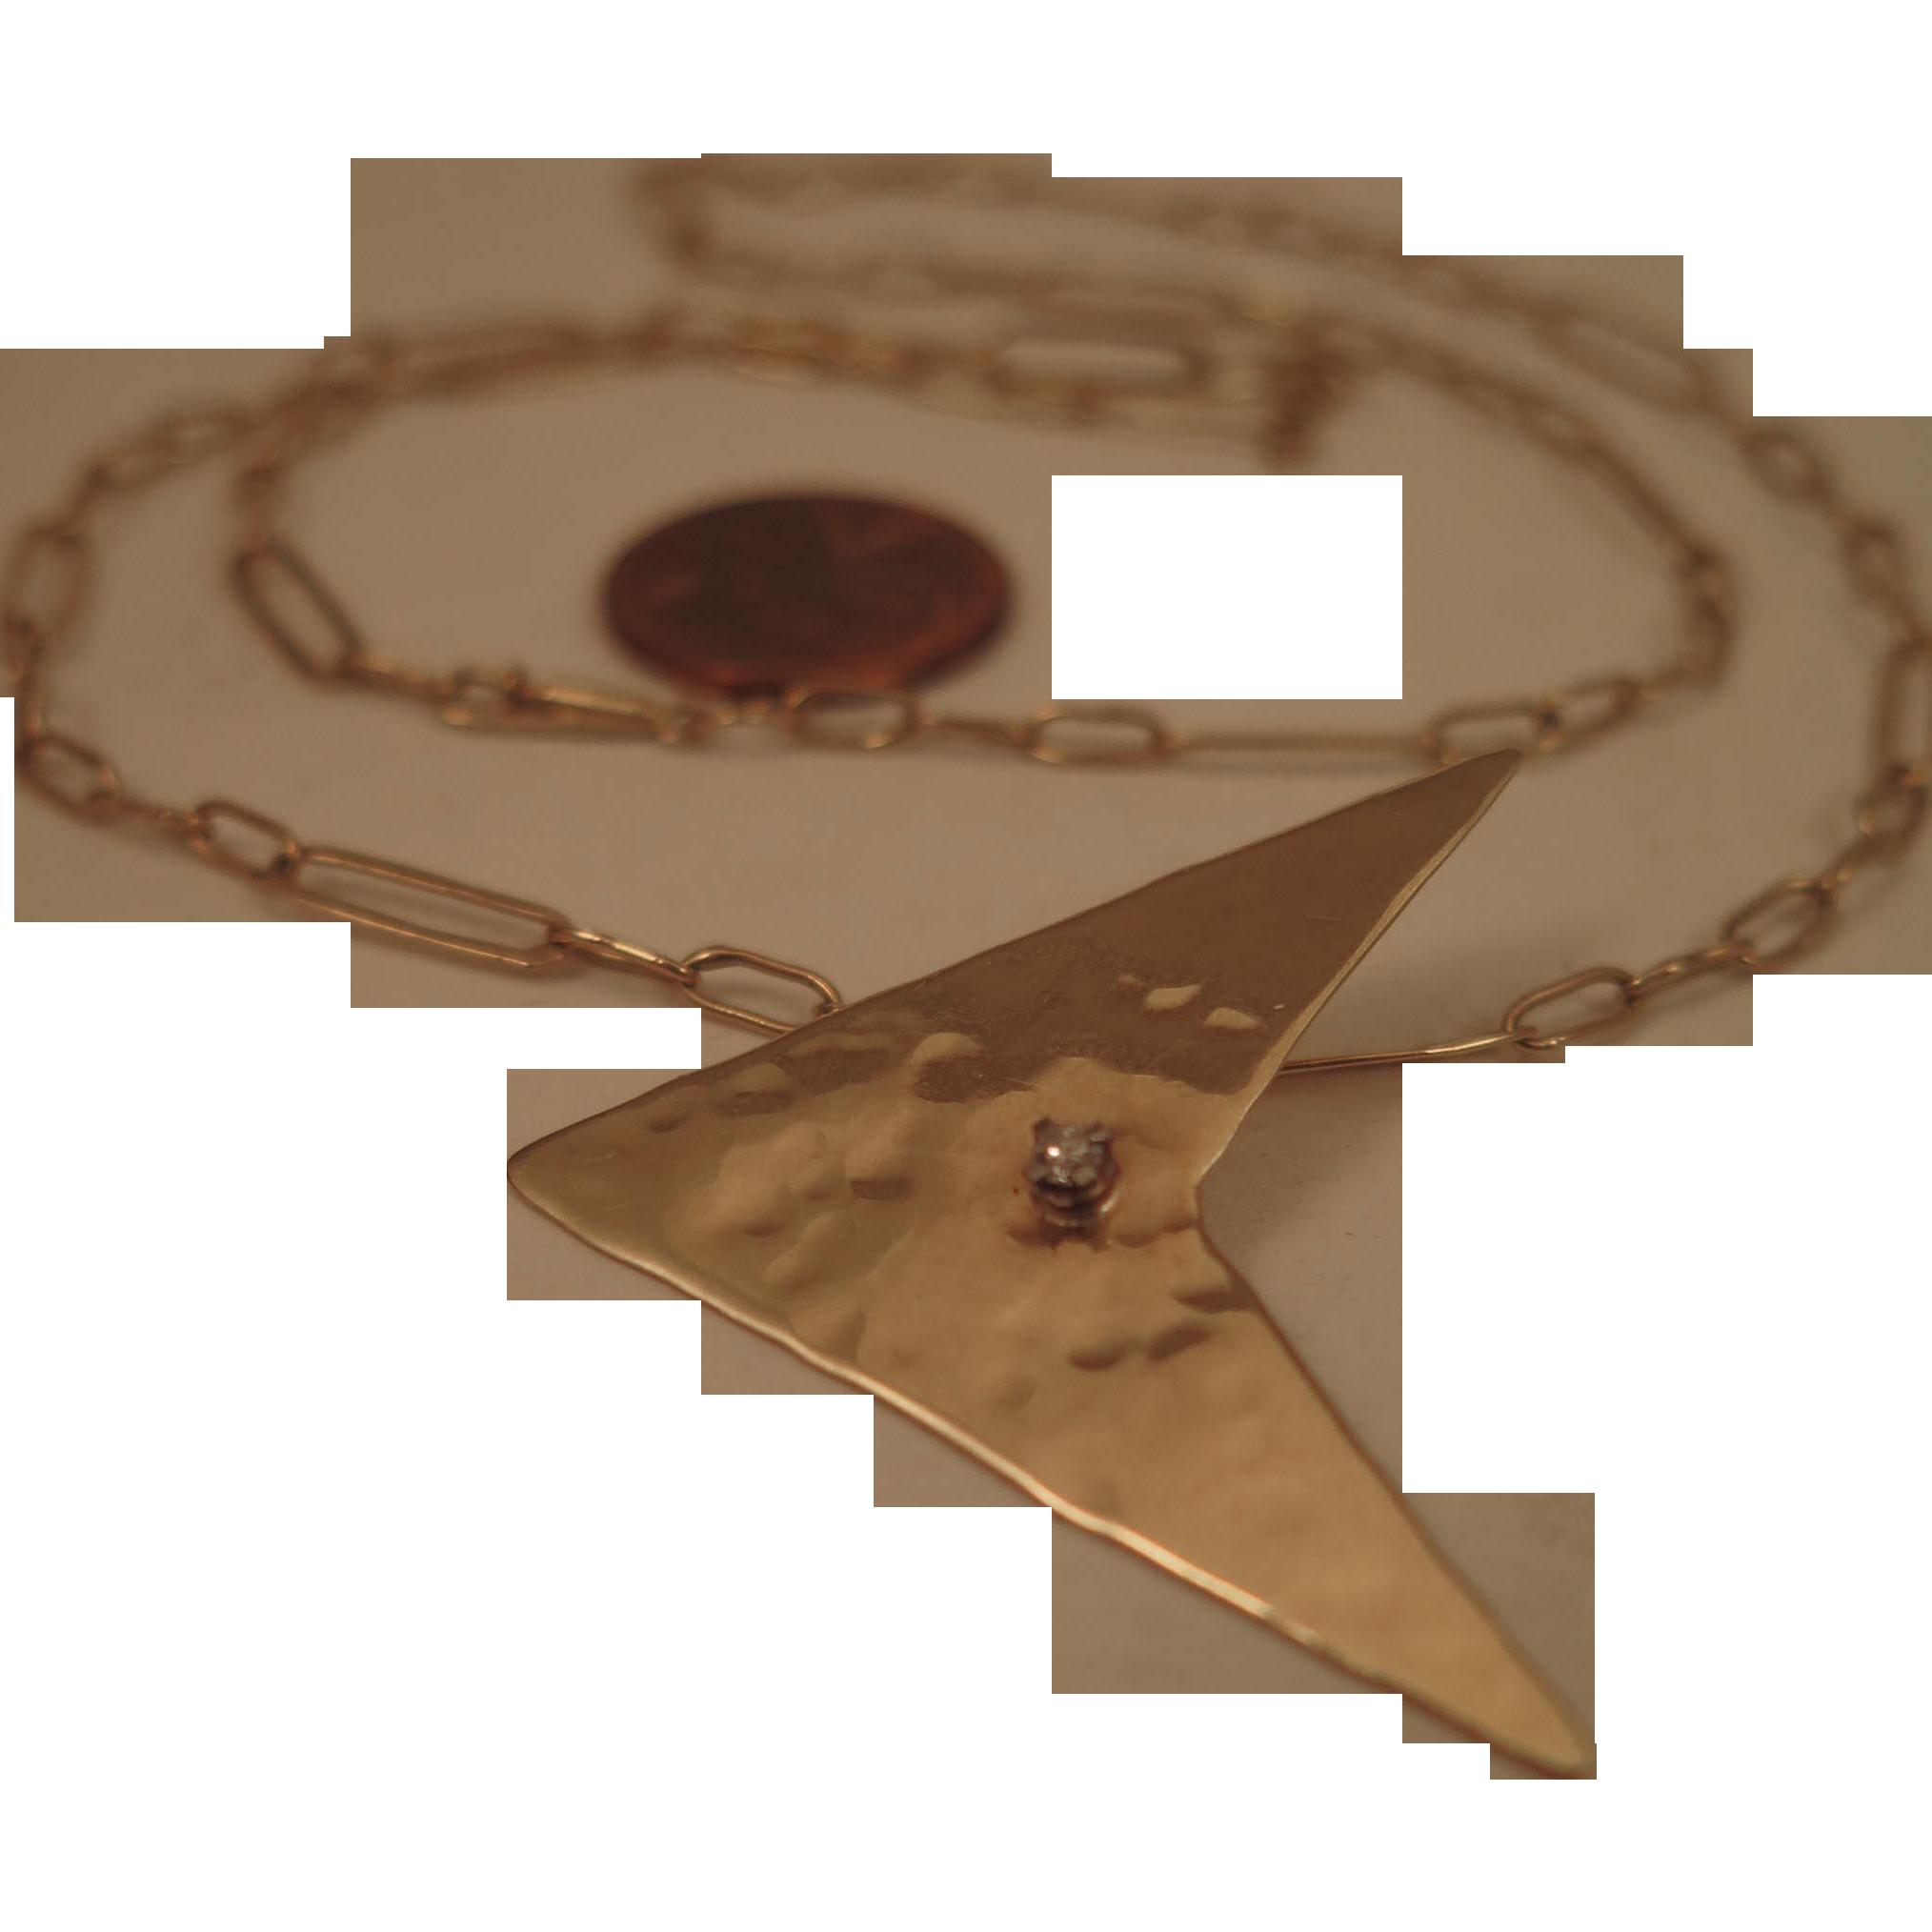 Vintage 14K Diamond Pendant on 18K Gold Necklace Chain